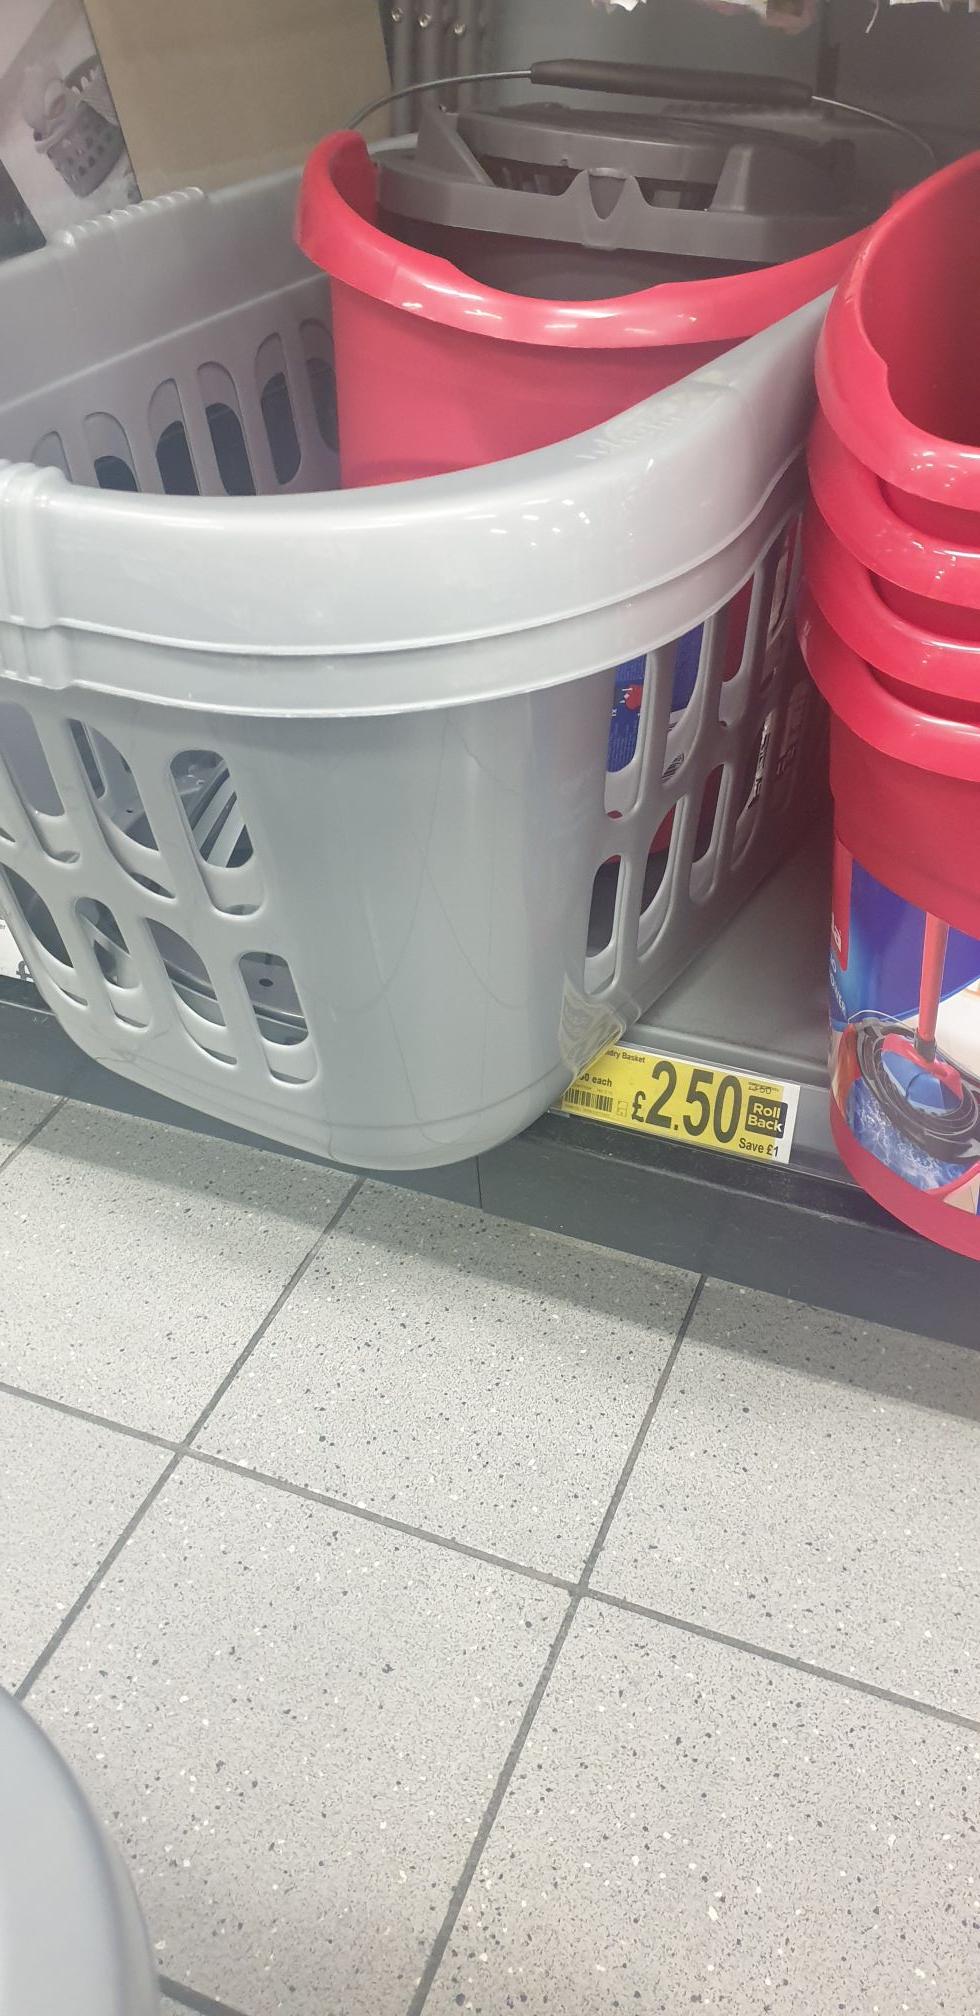 Laundry basket £2.50 instore in Asda Batley